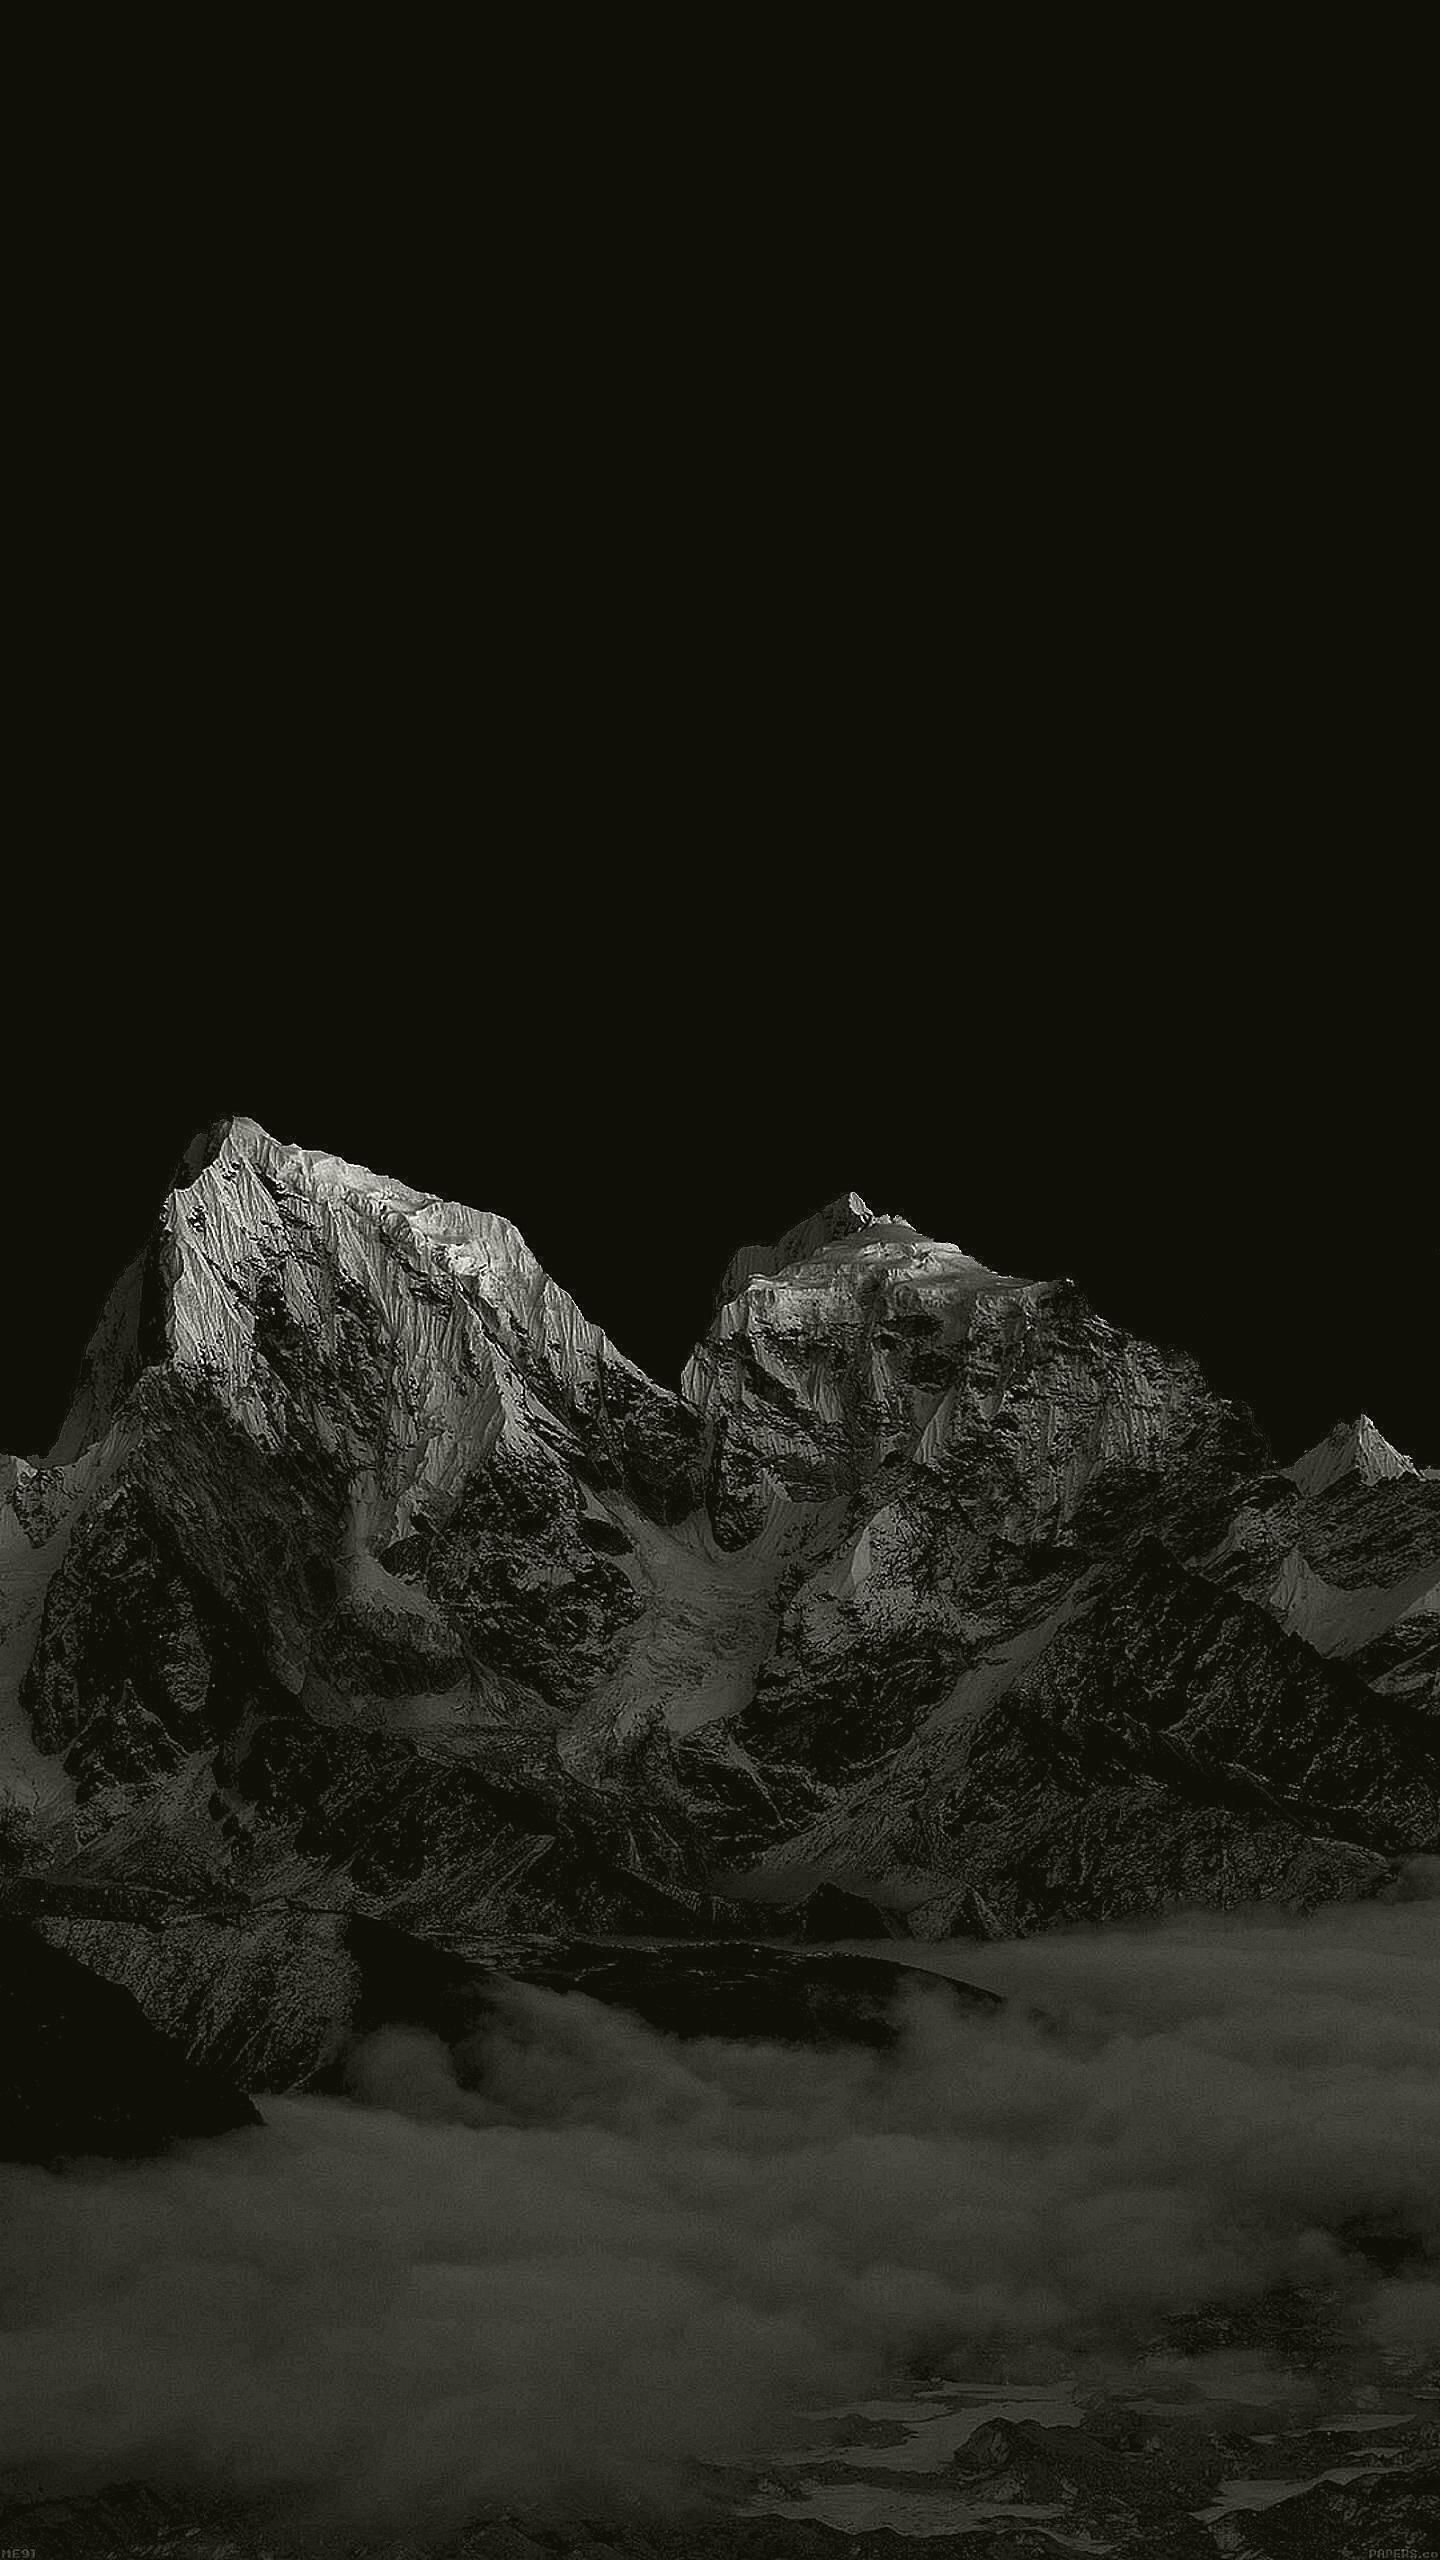 Dark Mountain Wallpaper 1440x2560 In 2020 Black Wallpaper Iphone Dark Dark Wallpaper Iphone Black Wallpaper Iphone